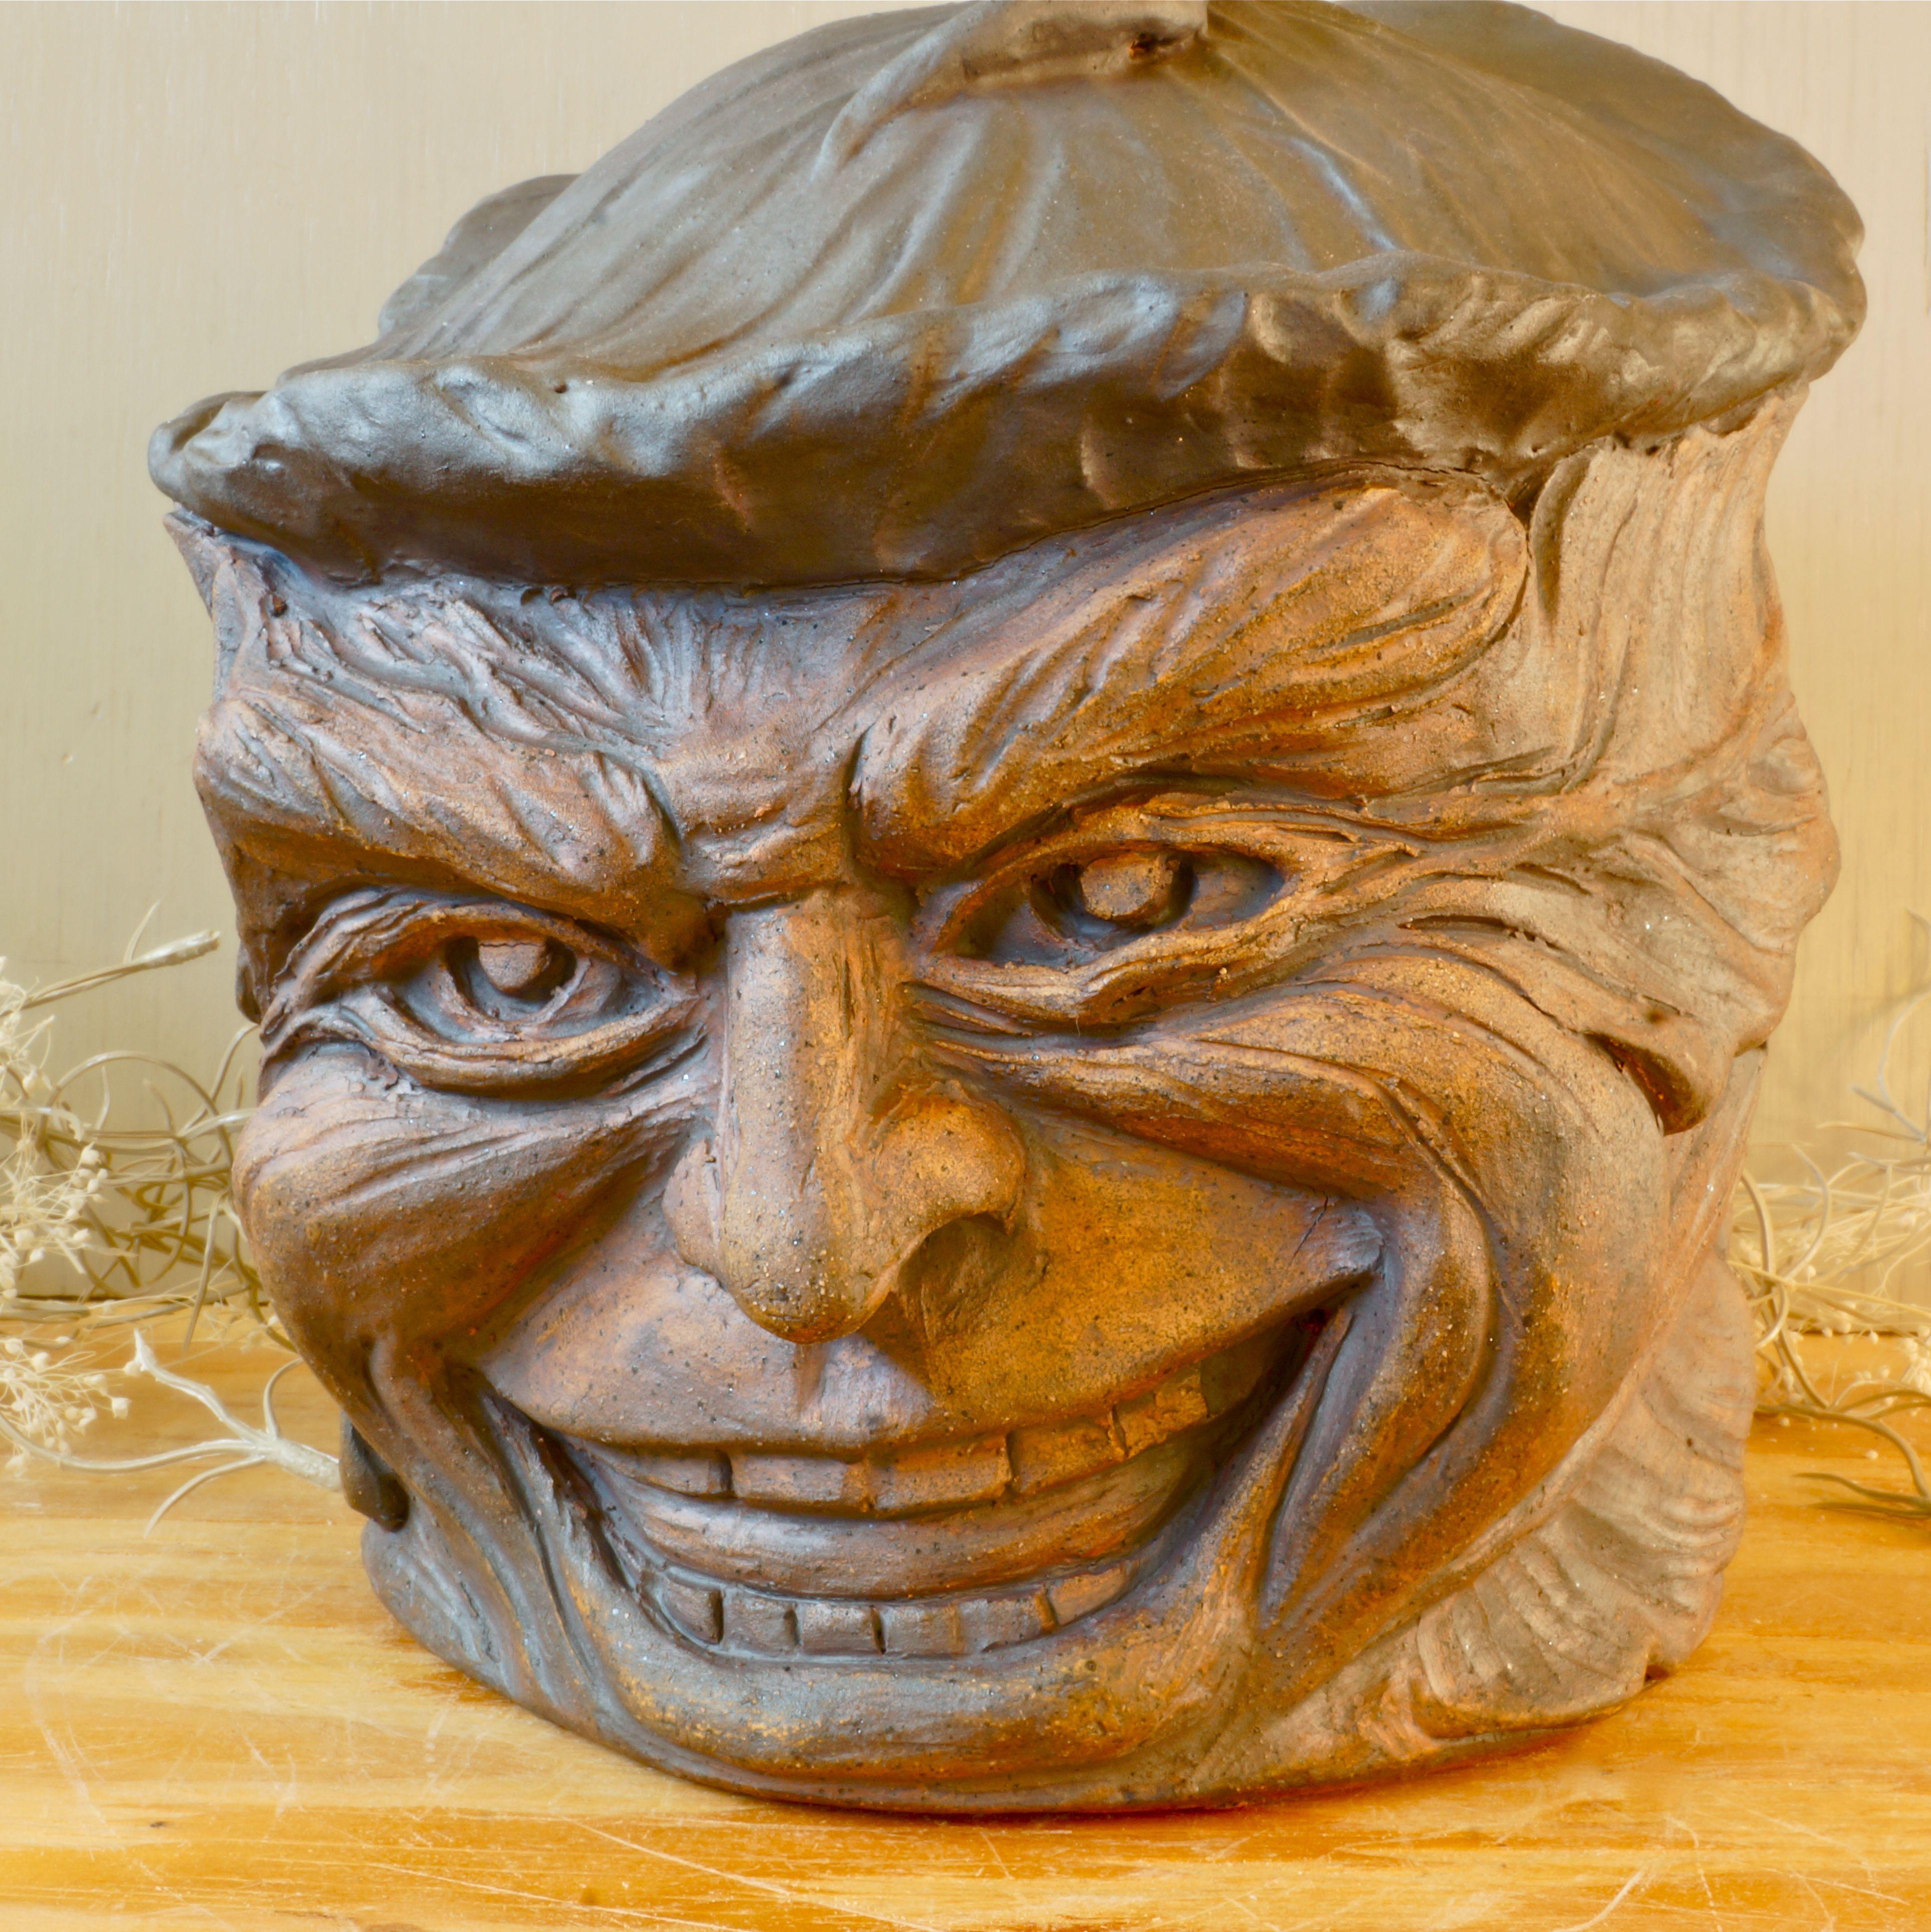 The ultimate tree carving chestercountyramblings